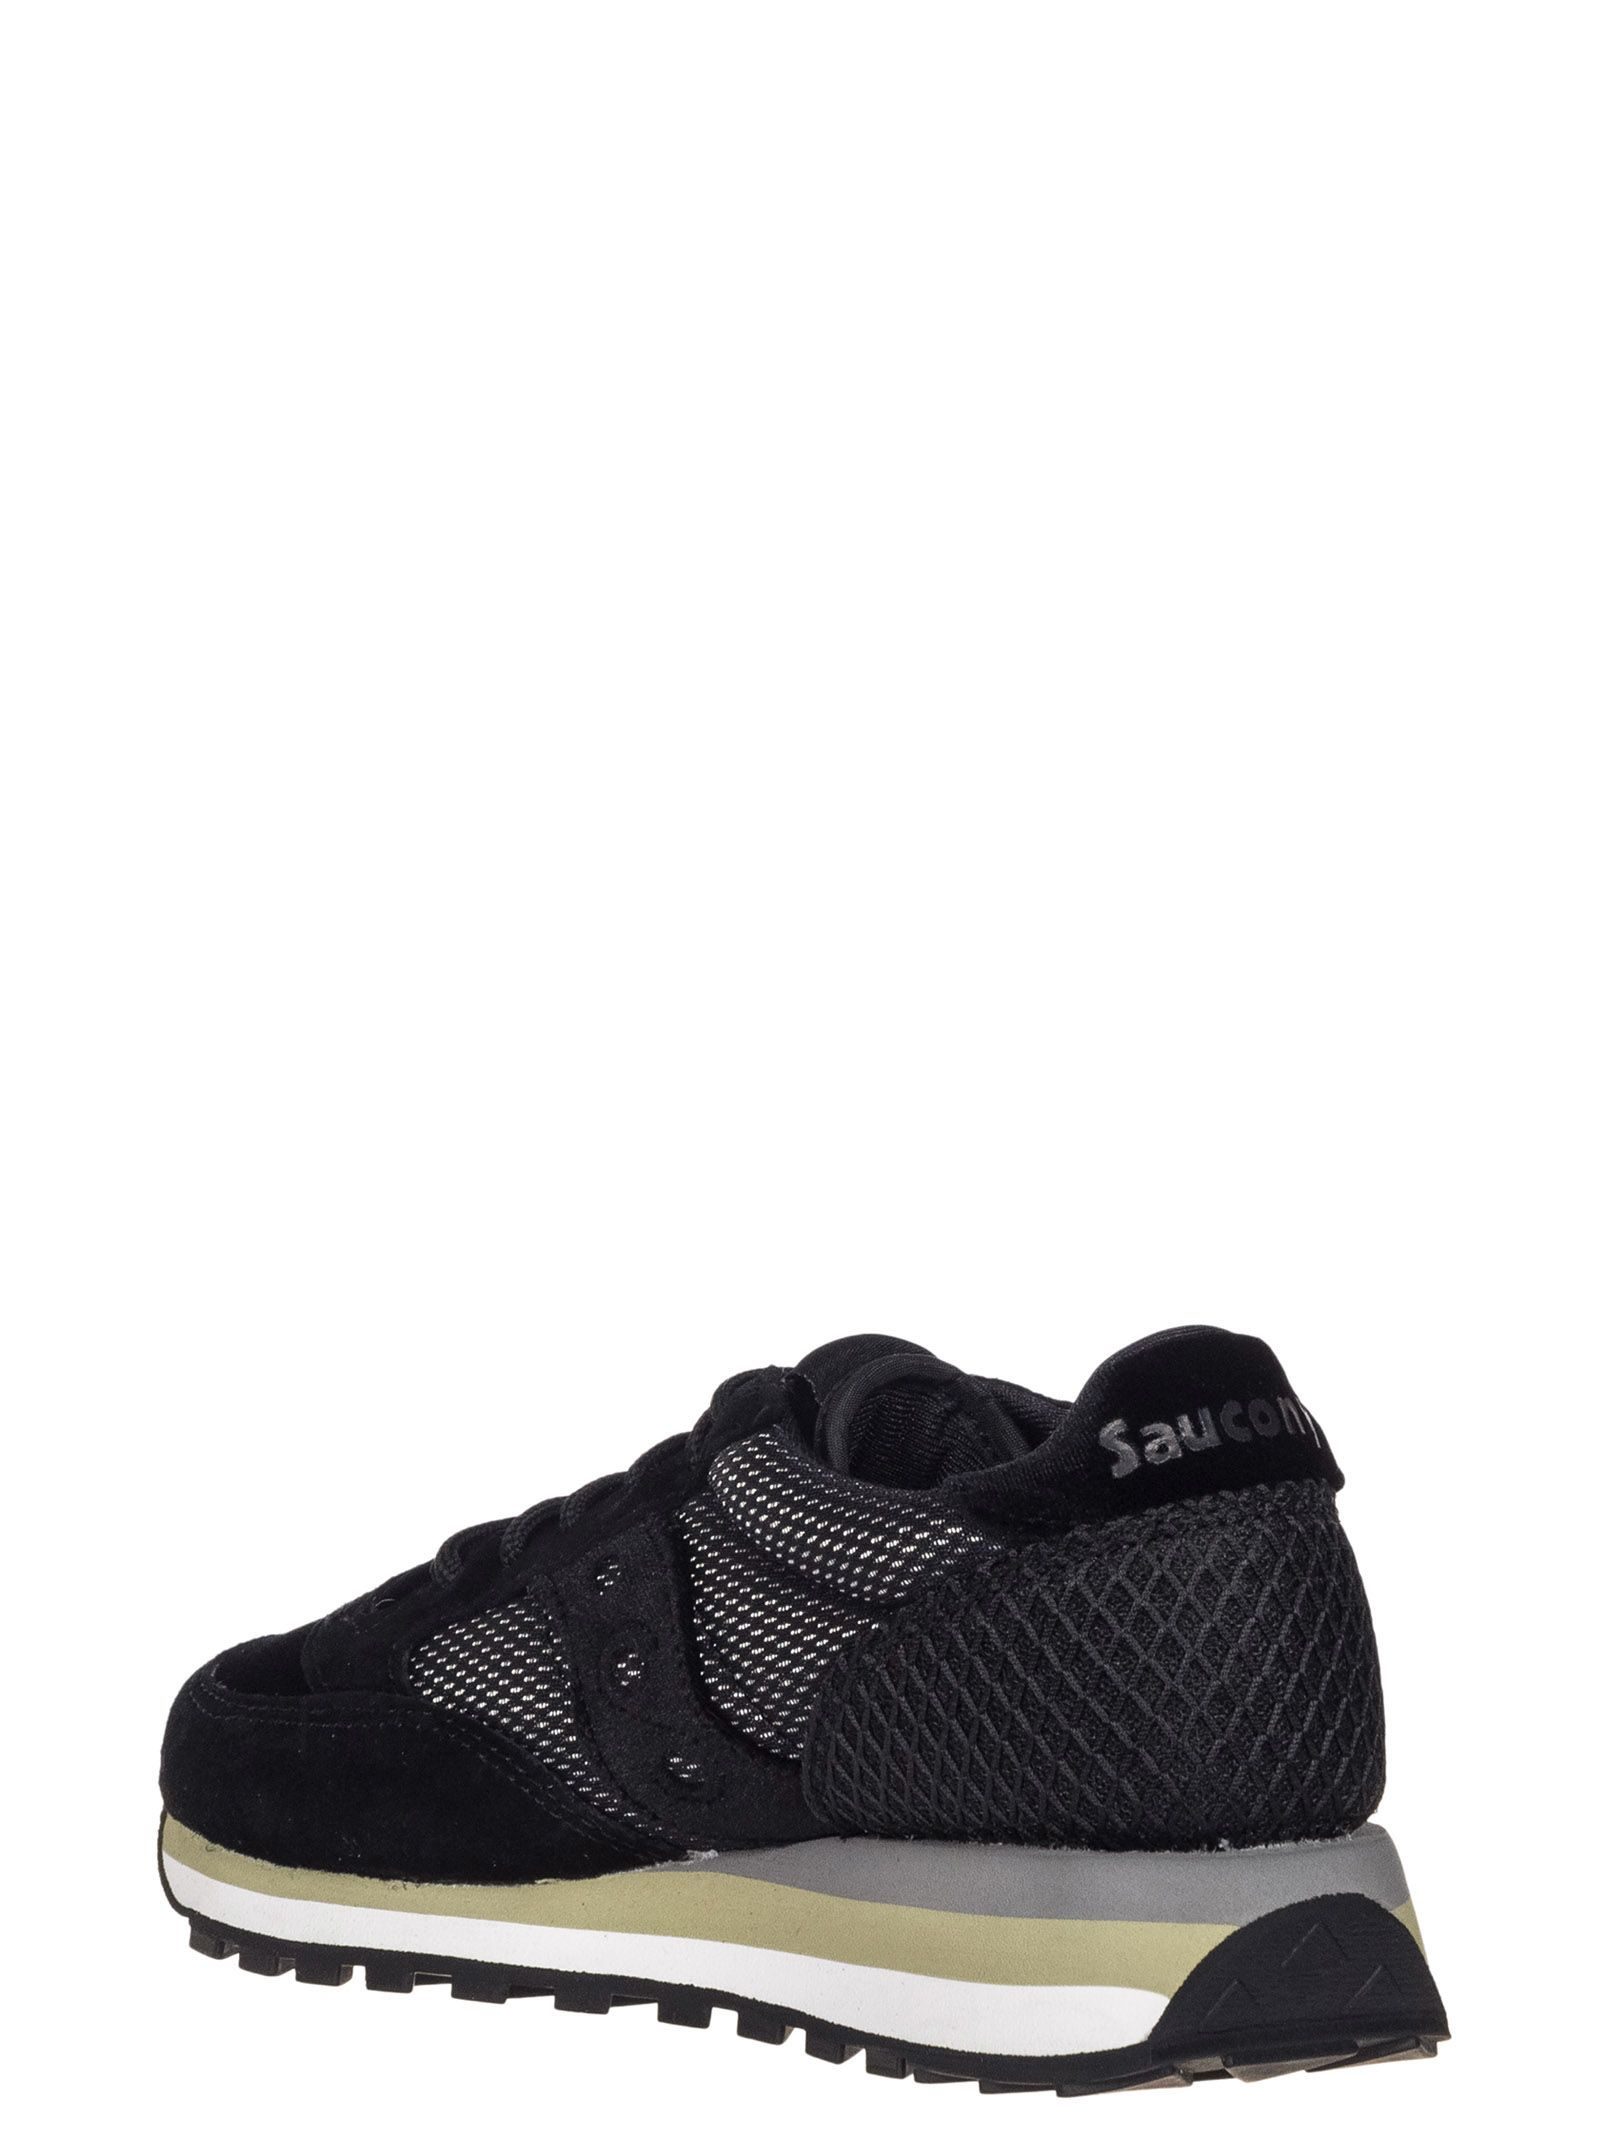 e75ae5d86ec6 Saucony Saucony Jazz Triple Sneakers - Black - 10889126